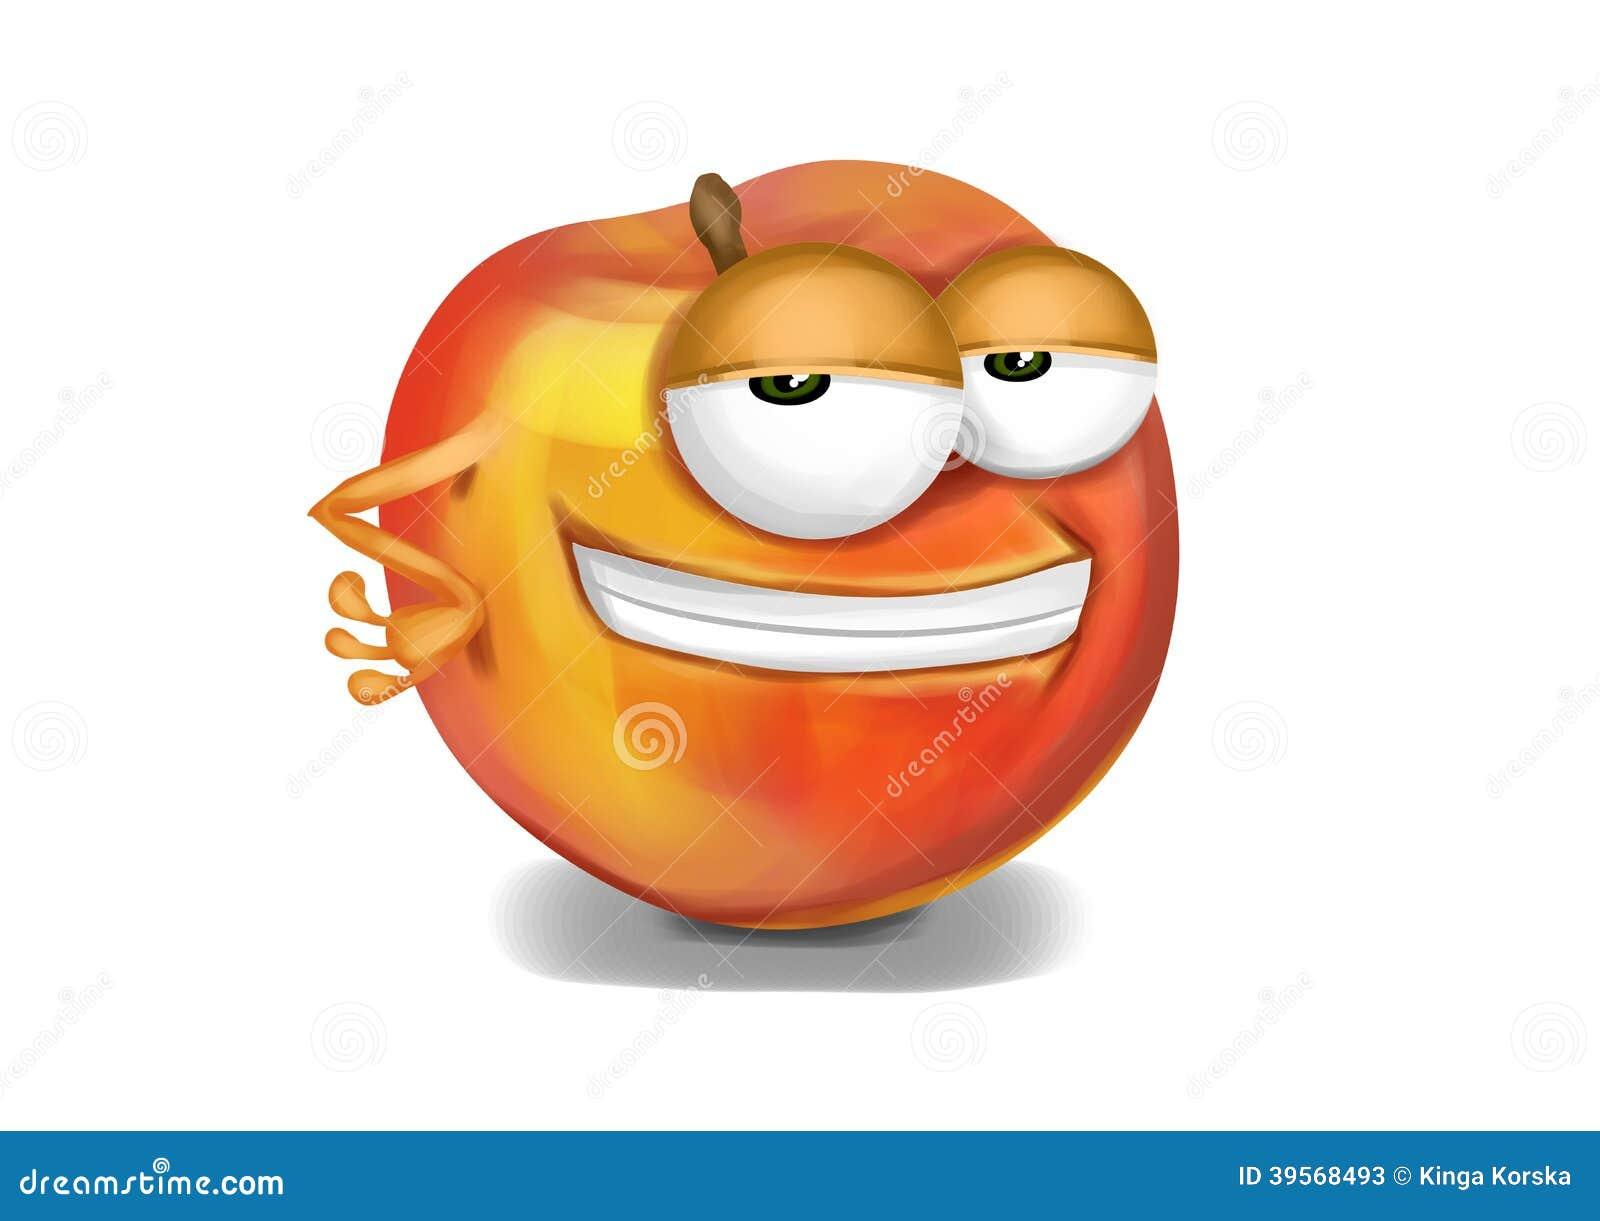 cool yellow nectarine cartoon character sly eyes stock